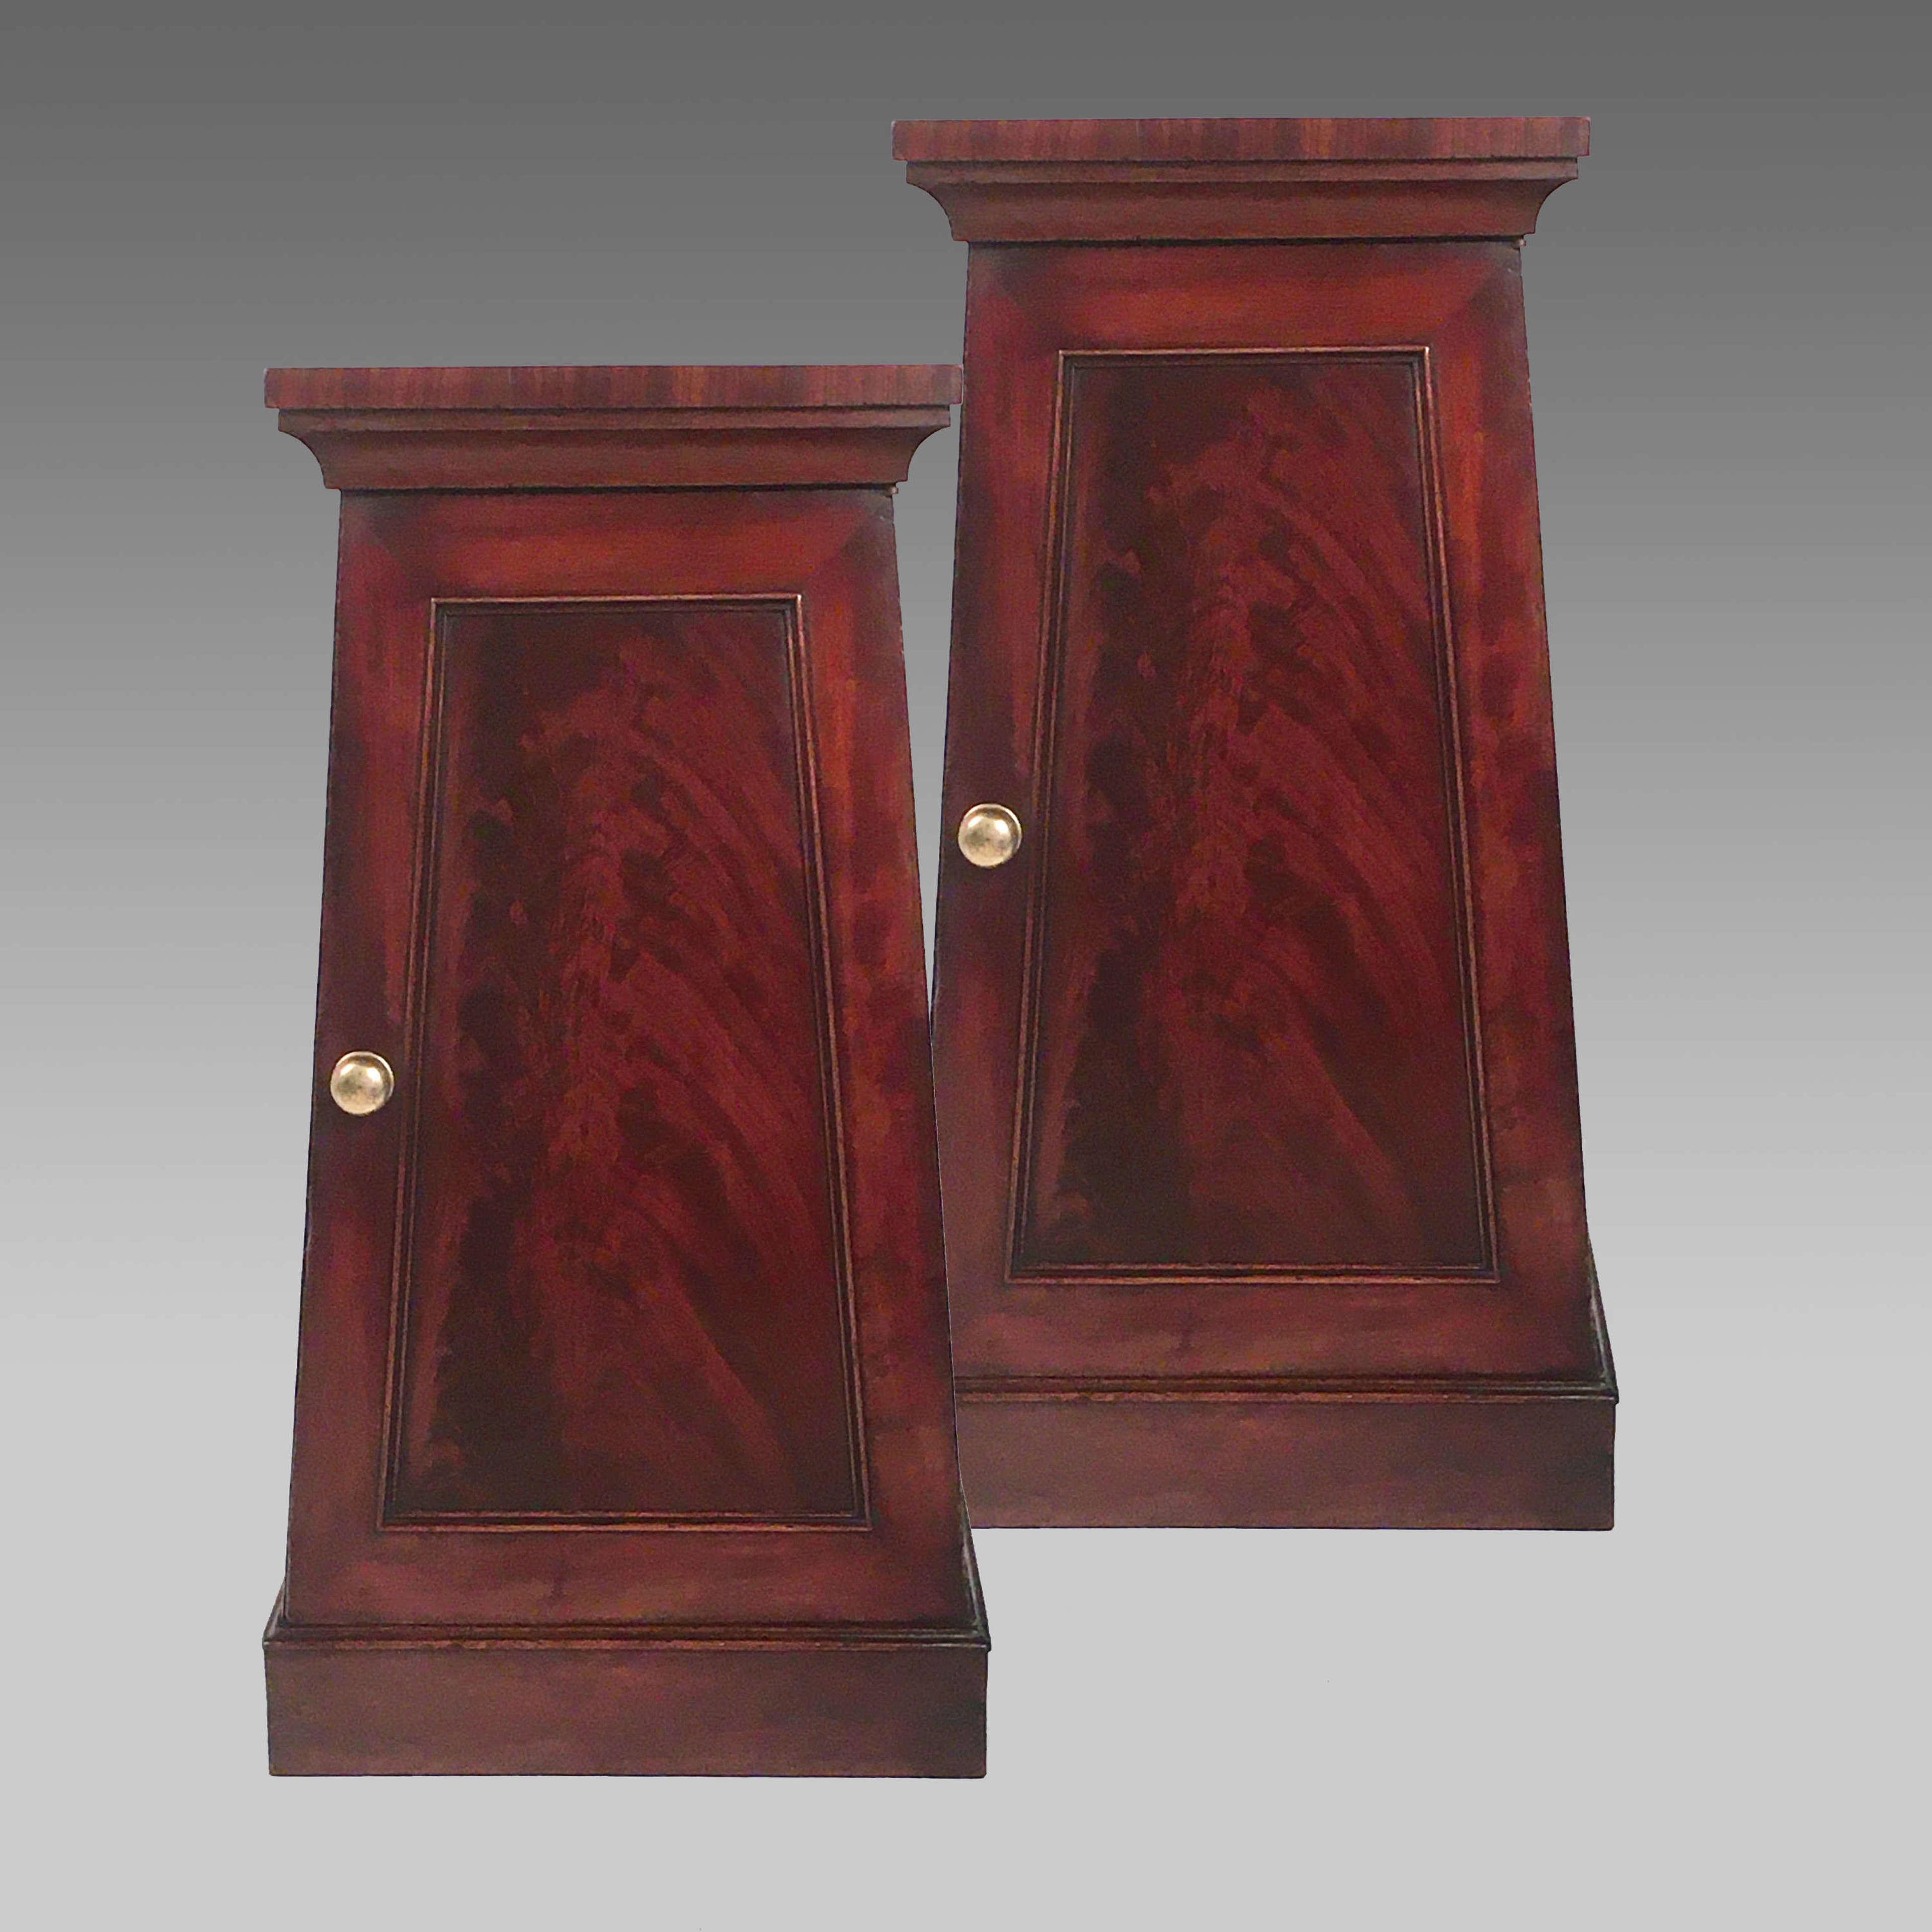 Pair classical Regency mahogany pedestal cabinets